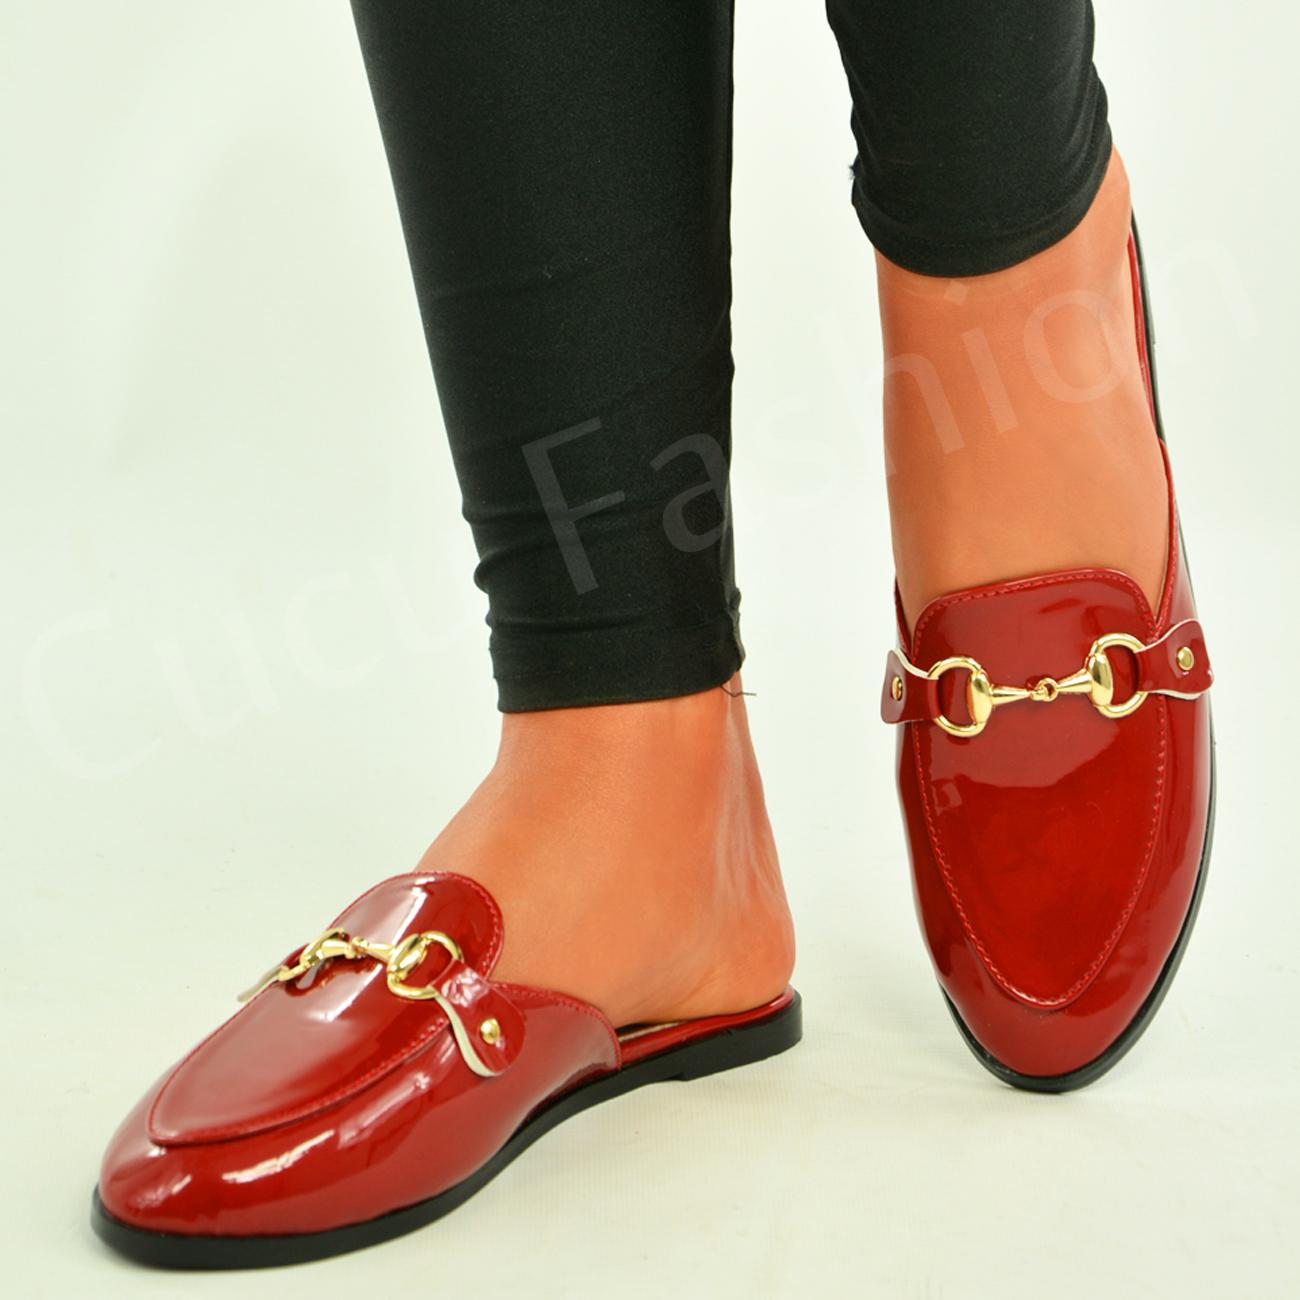 Excellent Mollini Marsy Black Nubuck Women Shoes Casuals Sandals Wedges Low